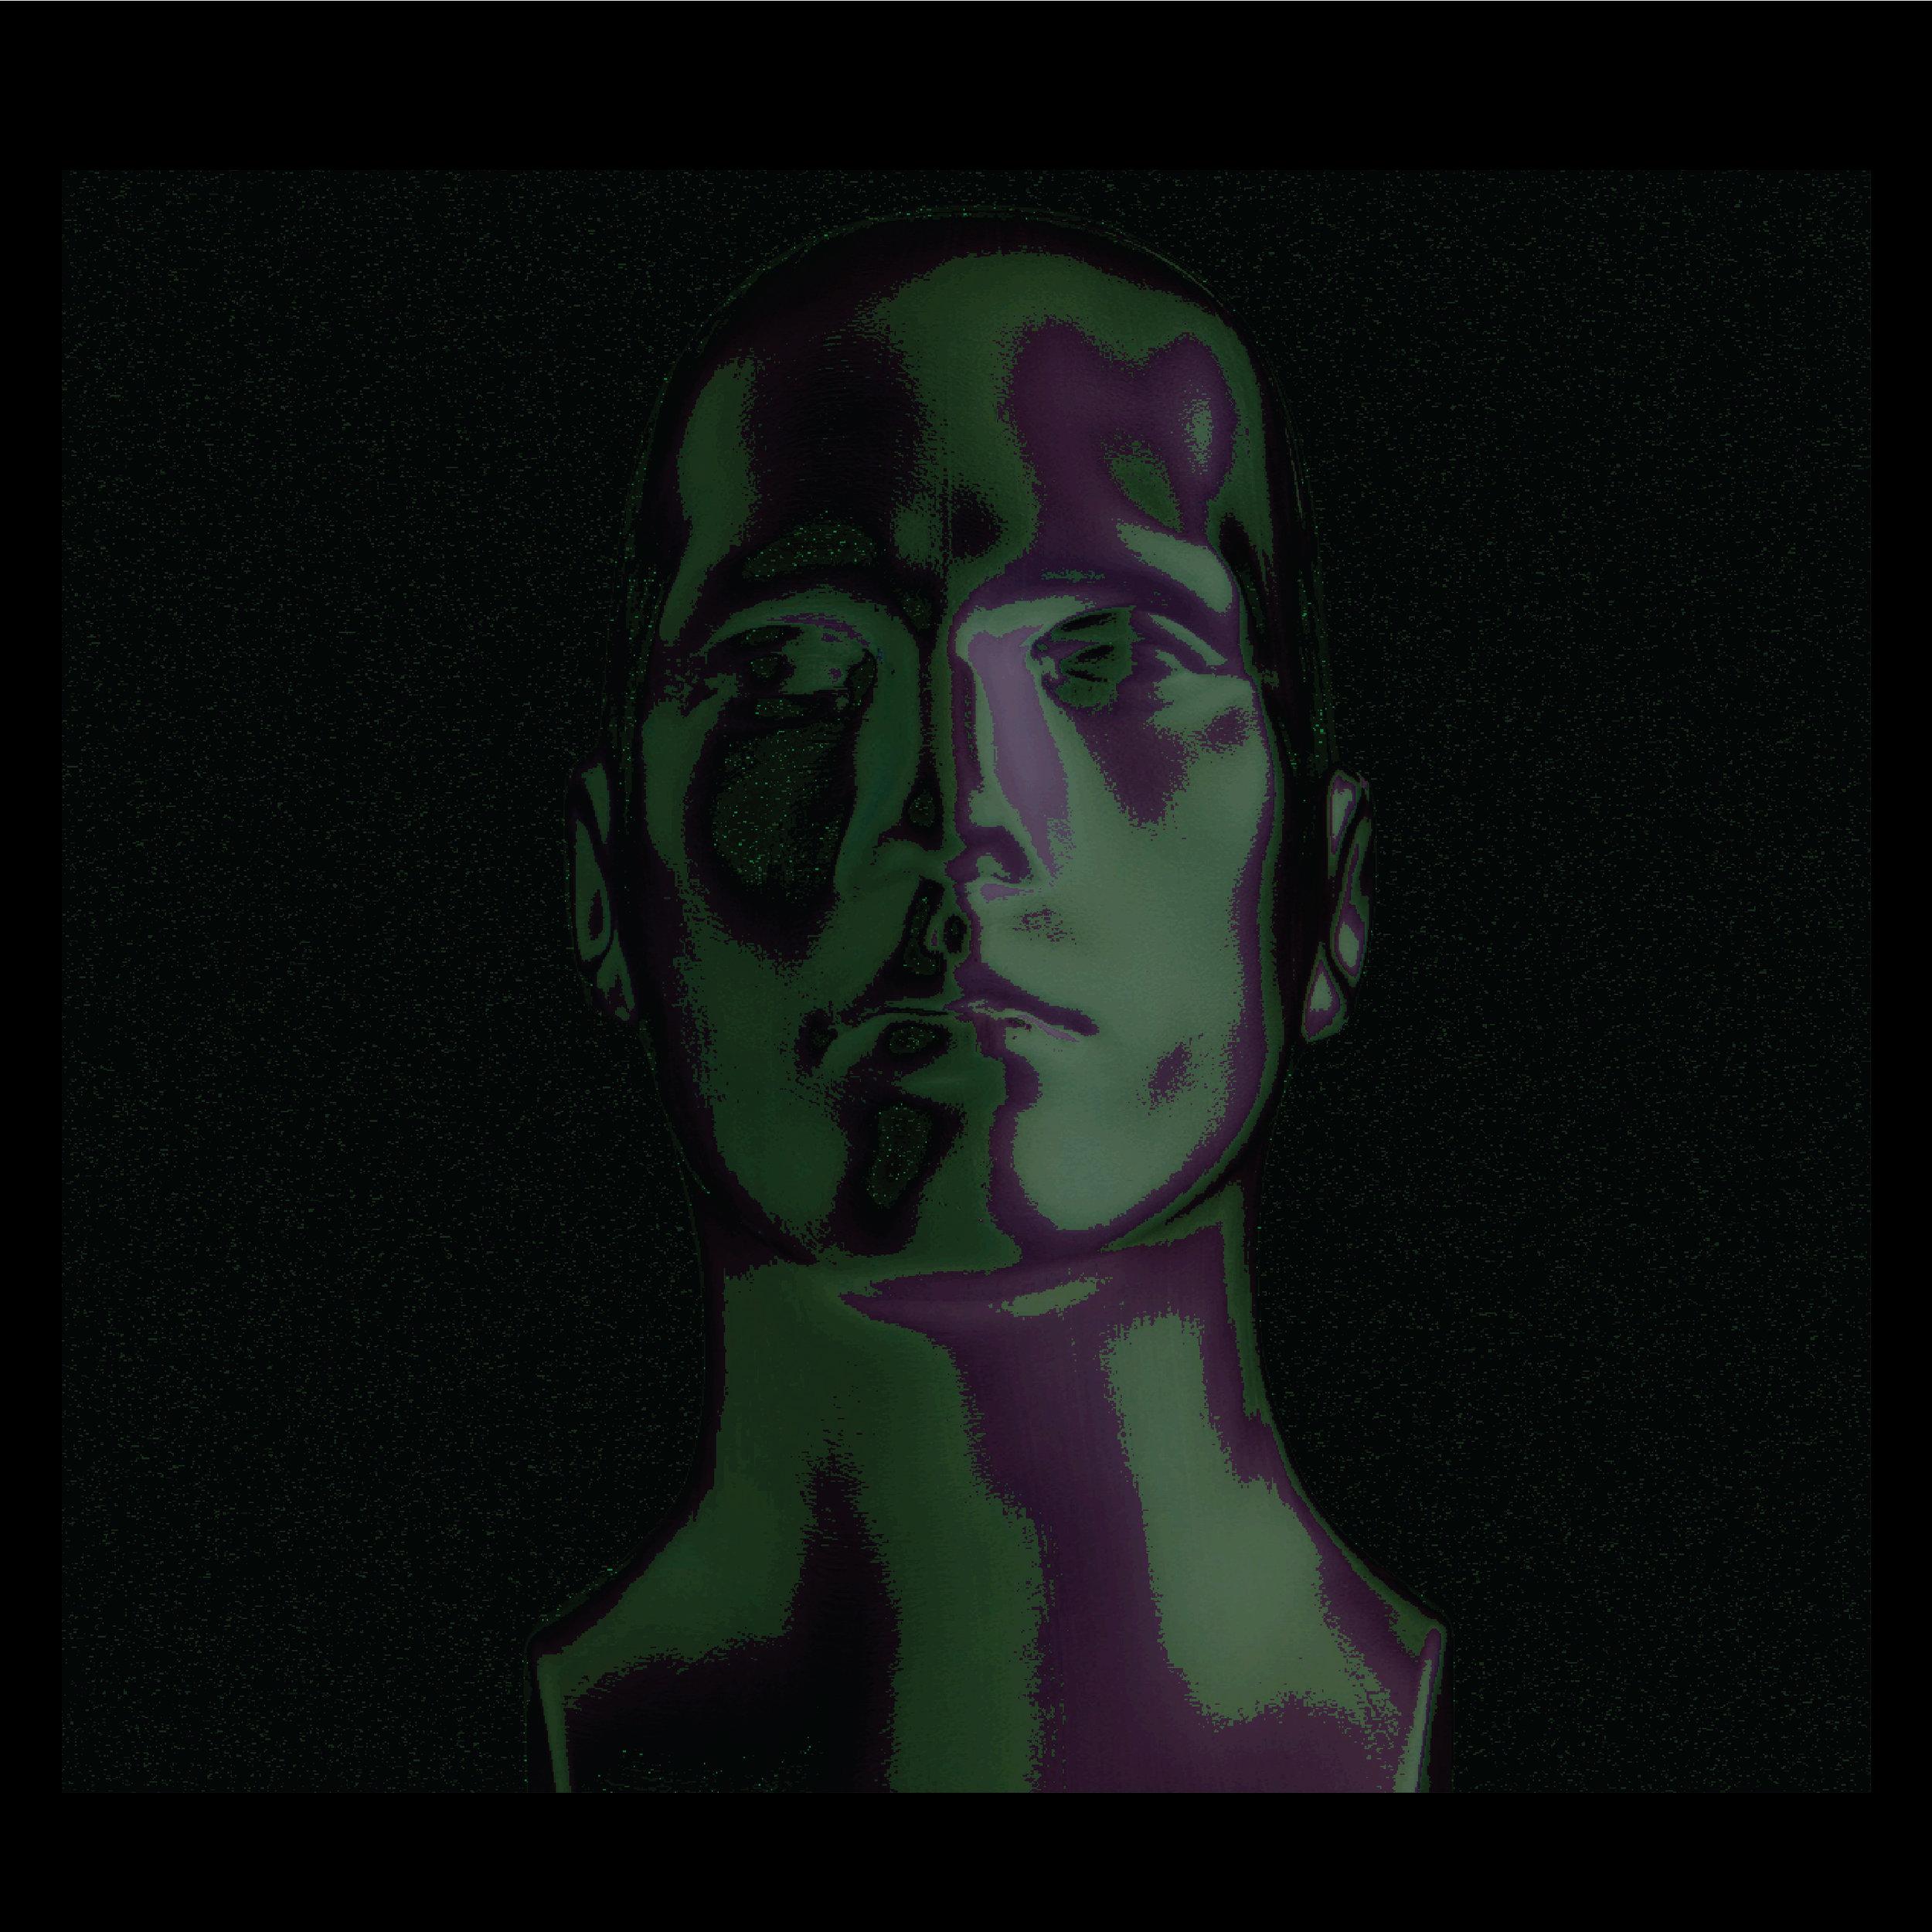 ONE CUT OFF ALBUM ART-01.jpg